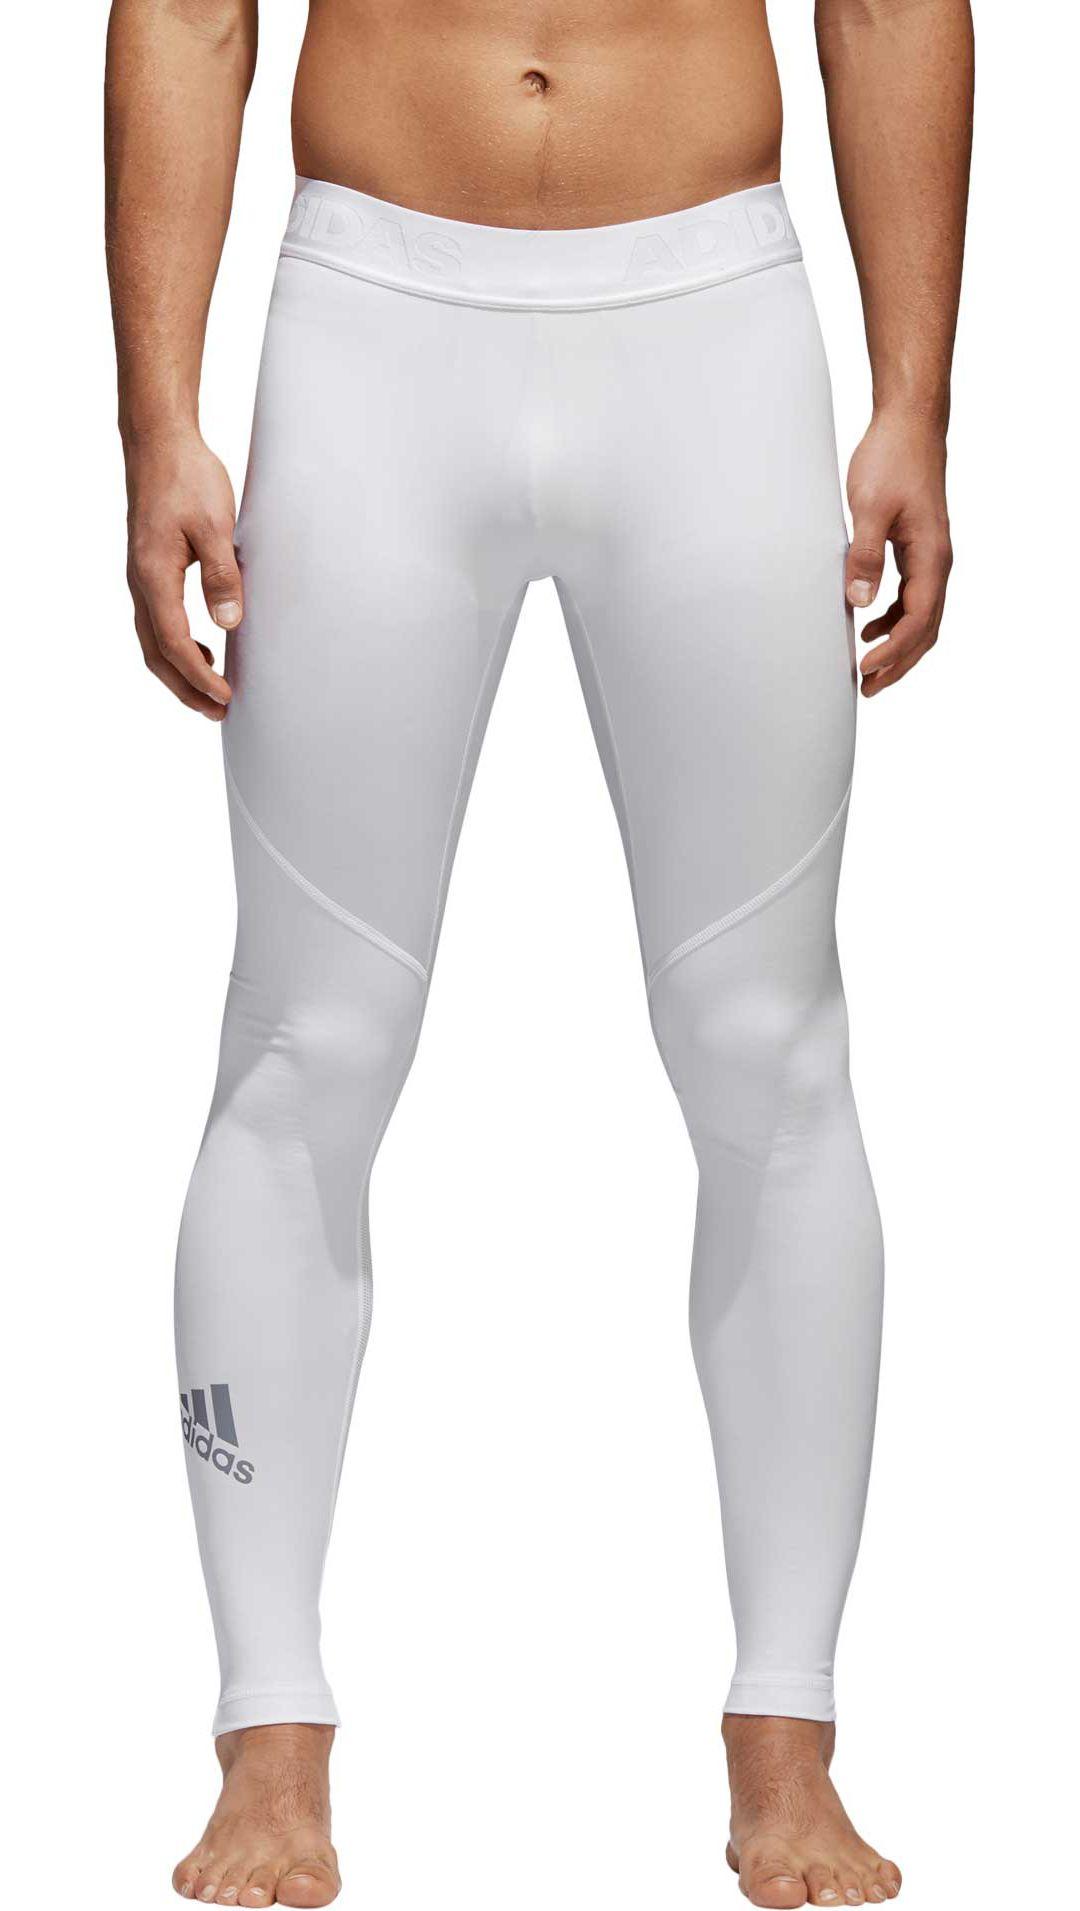 7d11fc6ec6947 adidas Men's Alphaskin Sport Training Tights. noImageFound. Previous